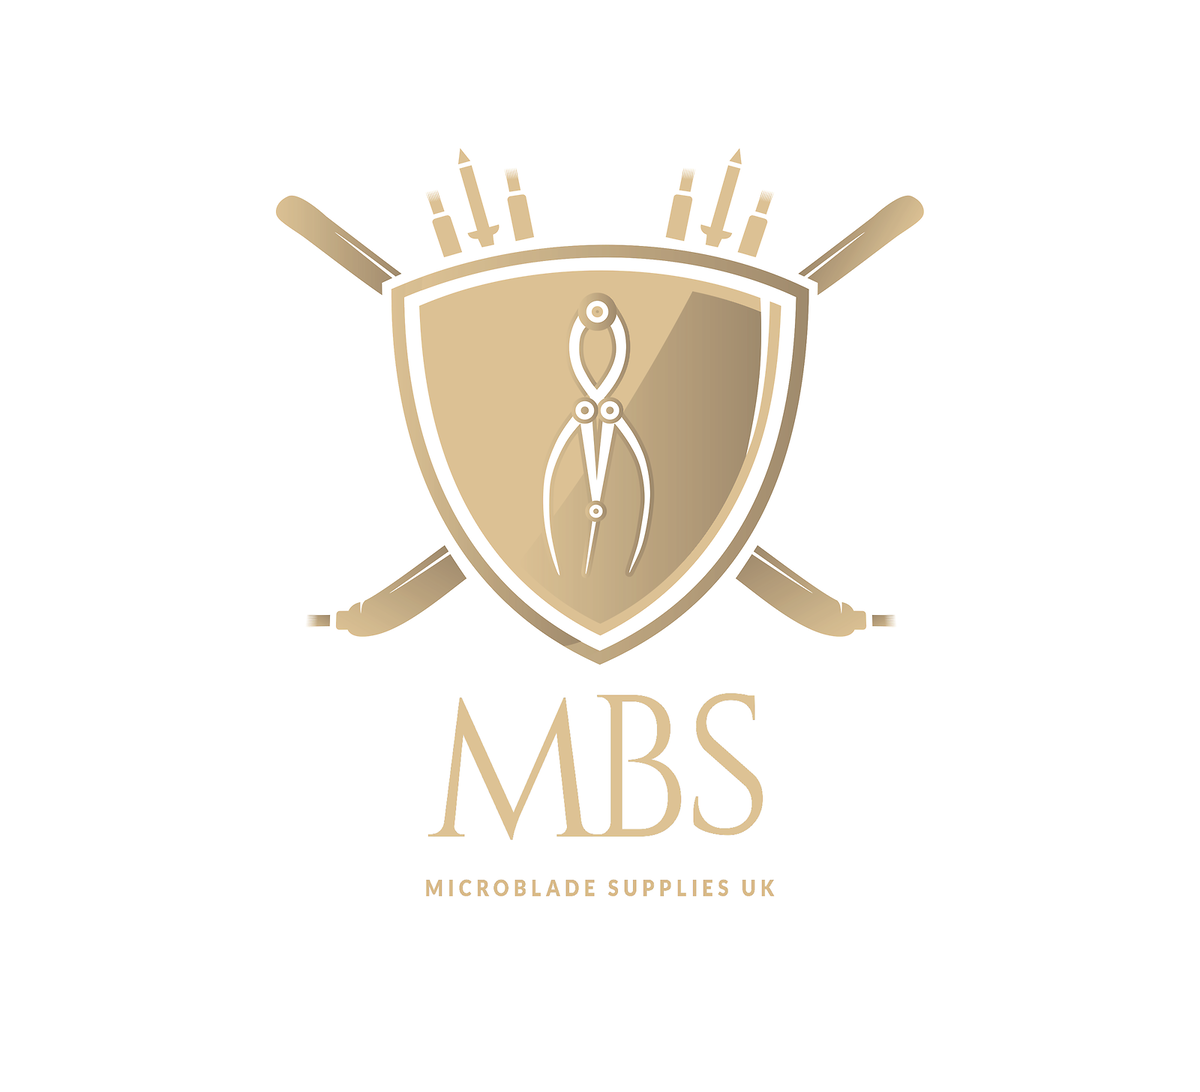 Microblading Supplies UK